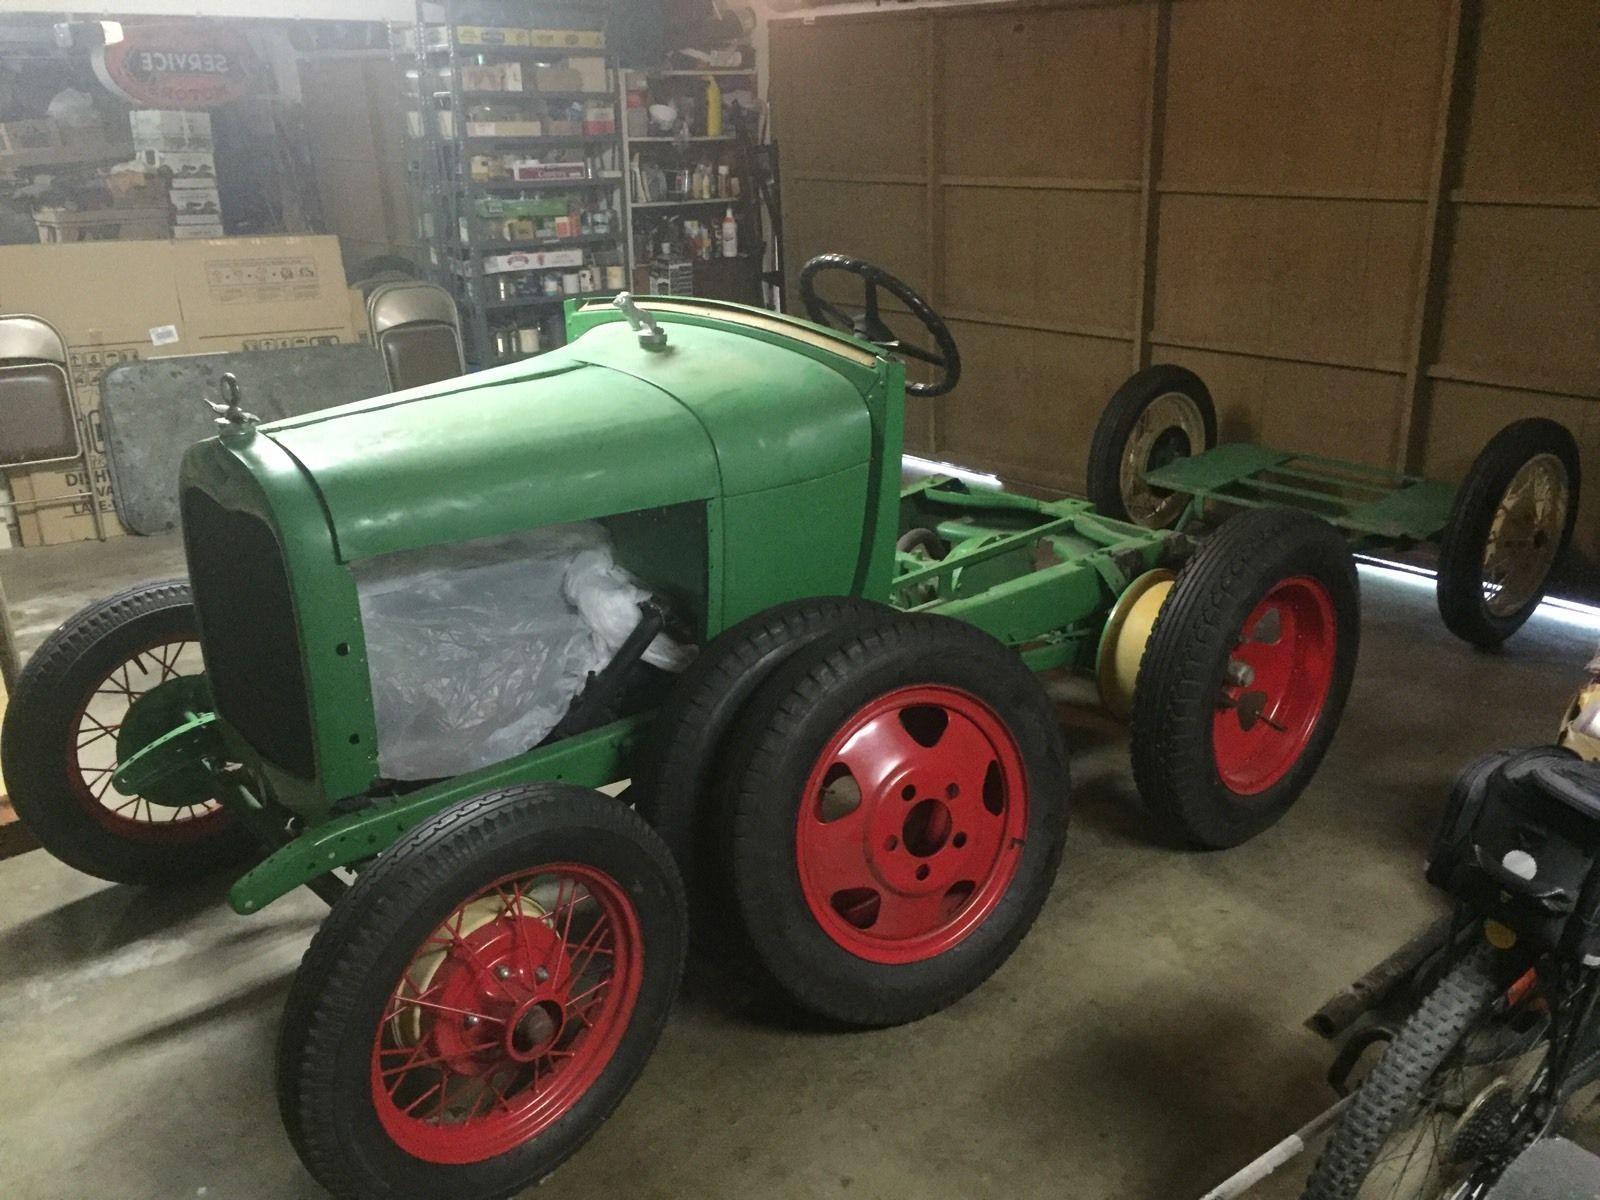 1928 1929 model aa ford truck doodlebug tractor w trailer rebuild or parts ebay